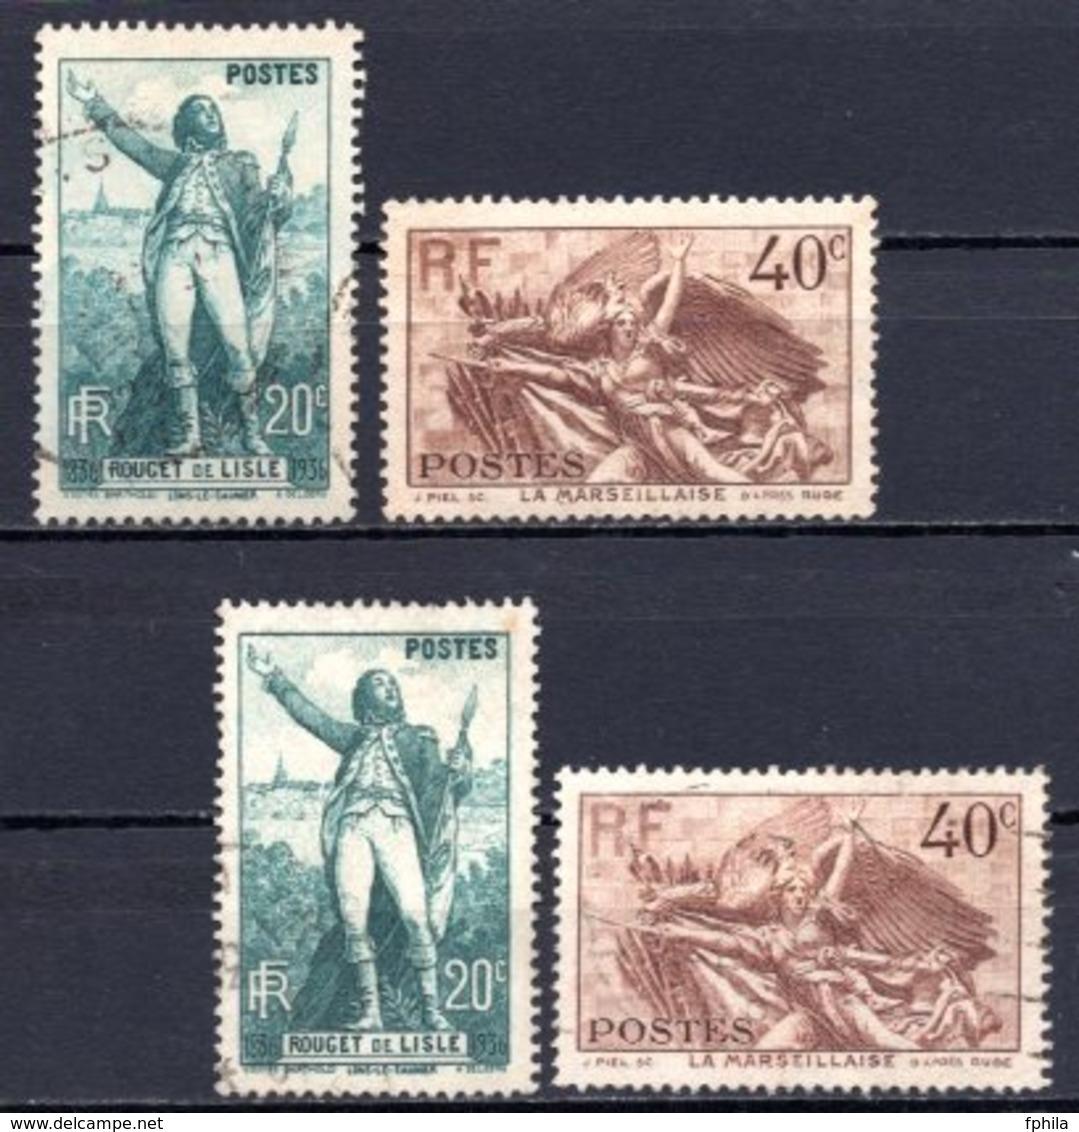 1936 FRANCE C. J. ROUGET DE LISLE 2x Sets MICHEL: 319-320 USED - Gebraucht